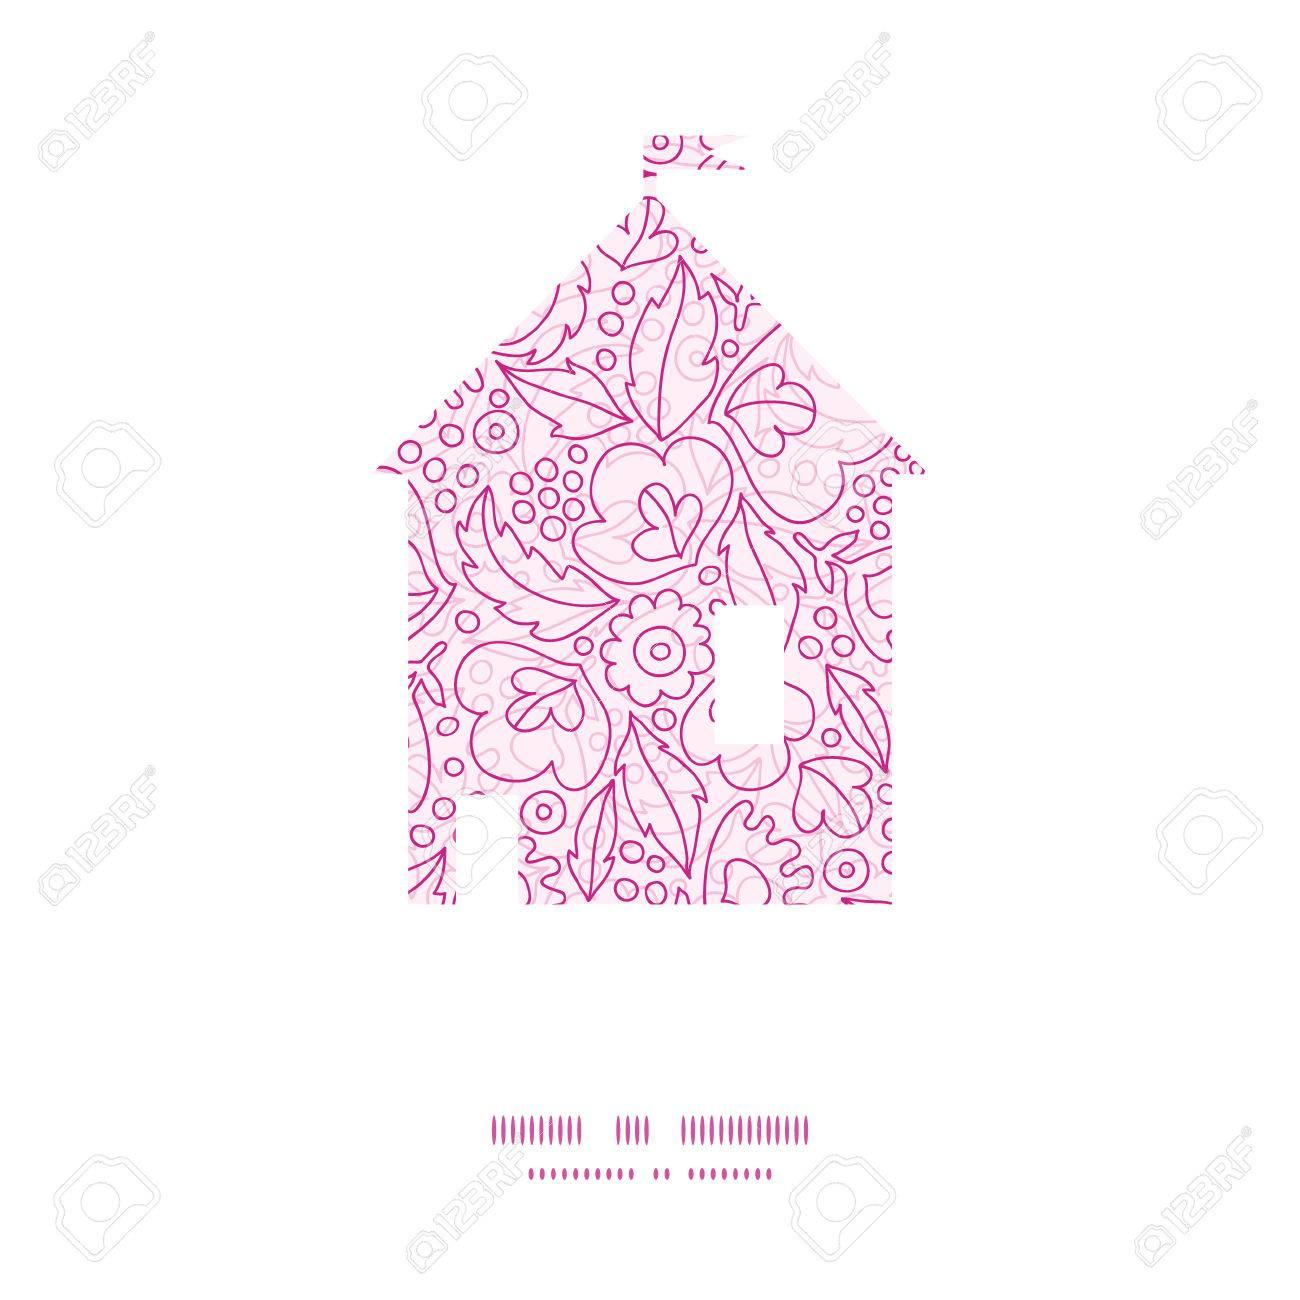 Vector Rosa Blüten Lineart Haus Silhouette Musterrahmen Lizenzfrei ...